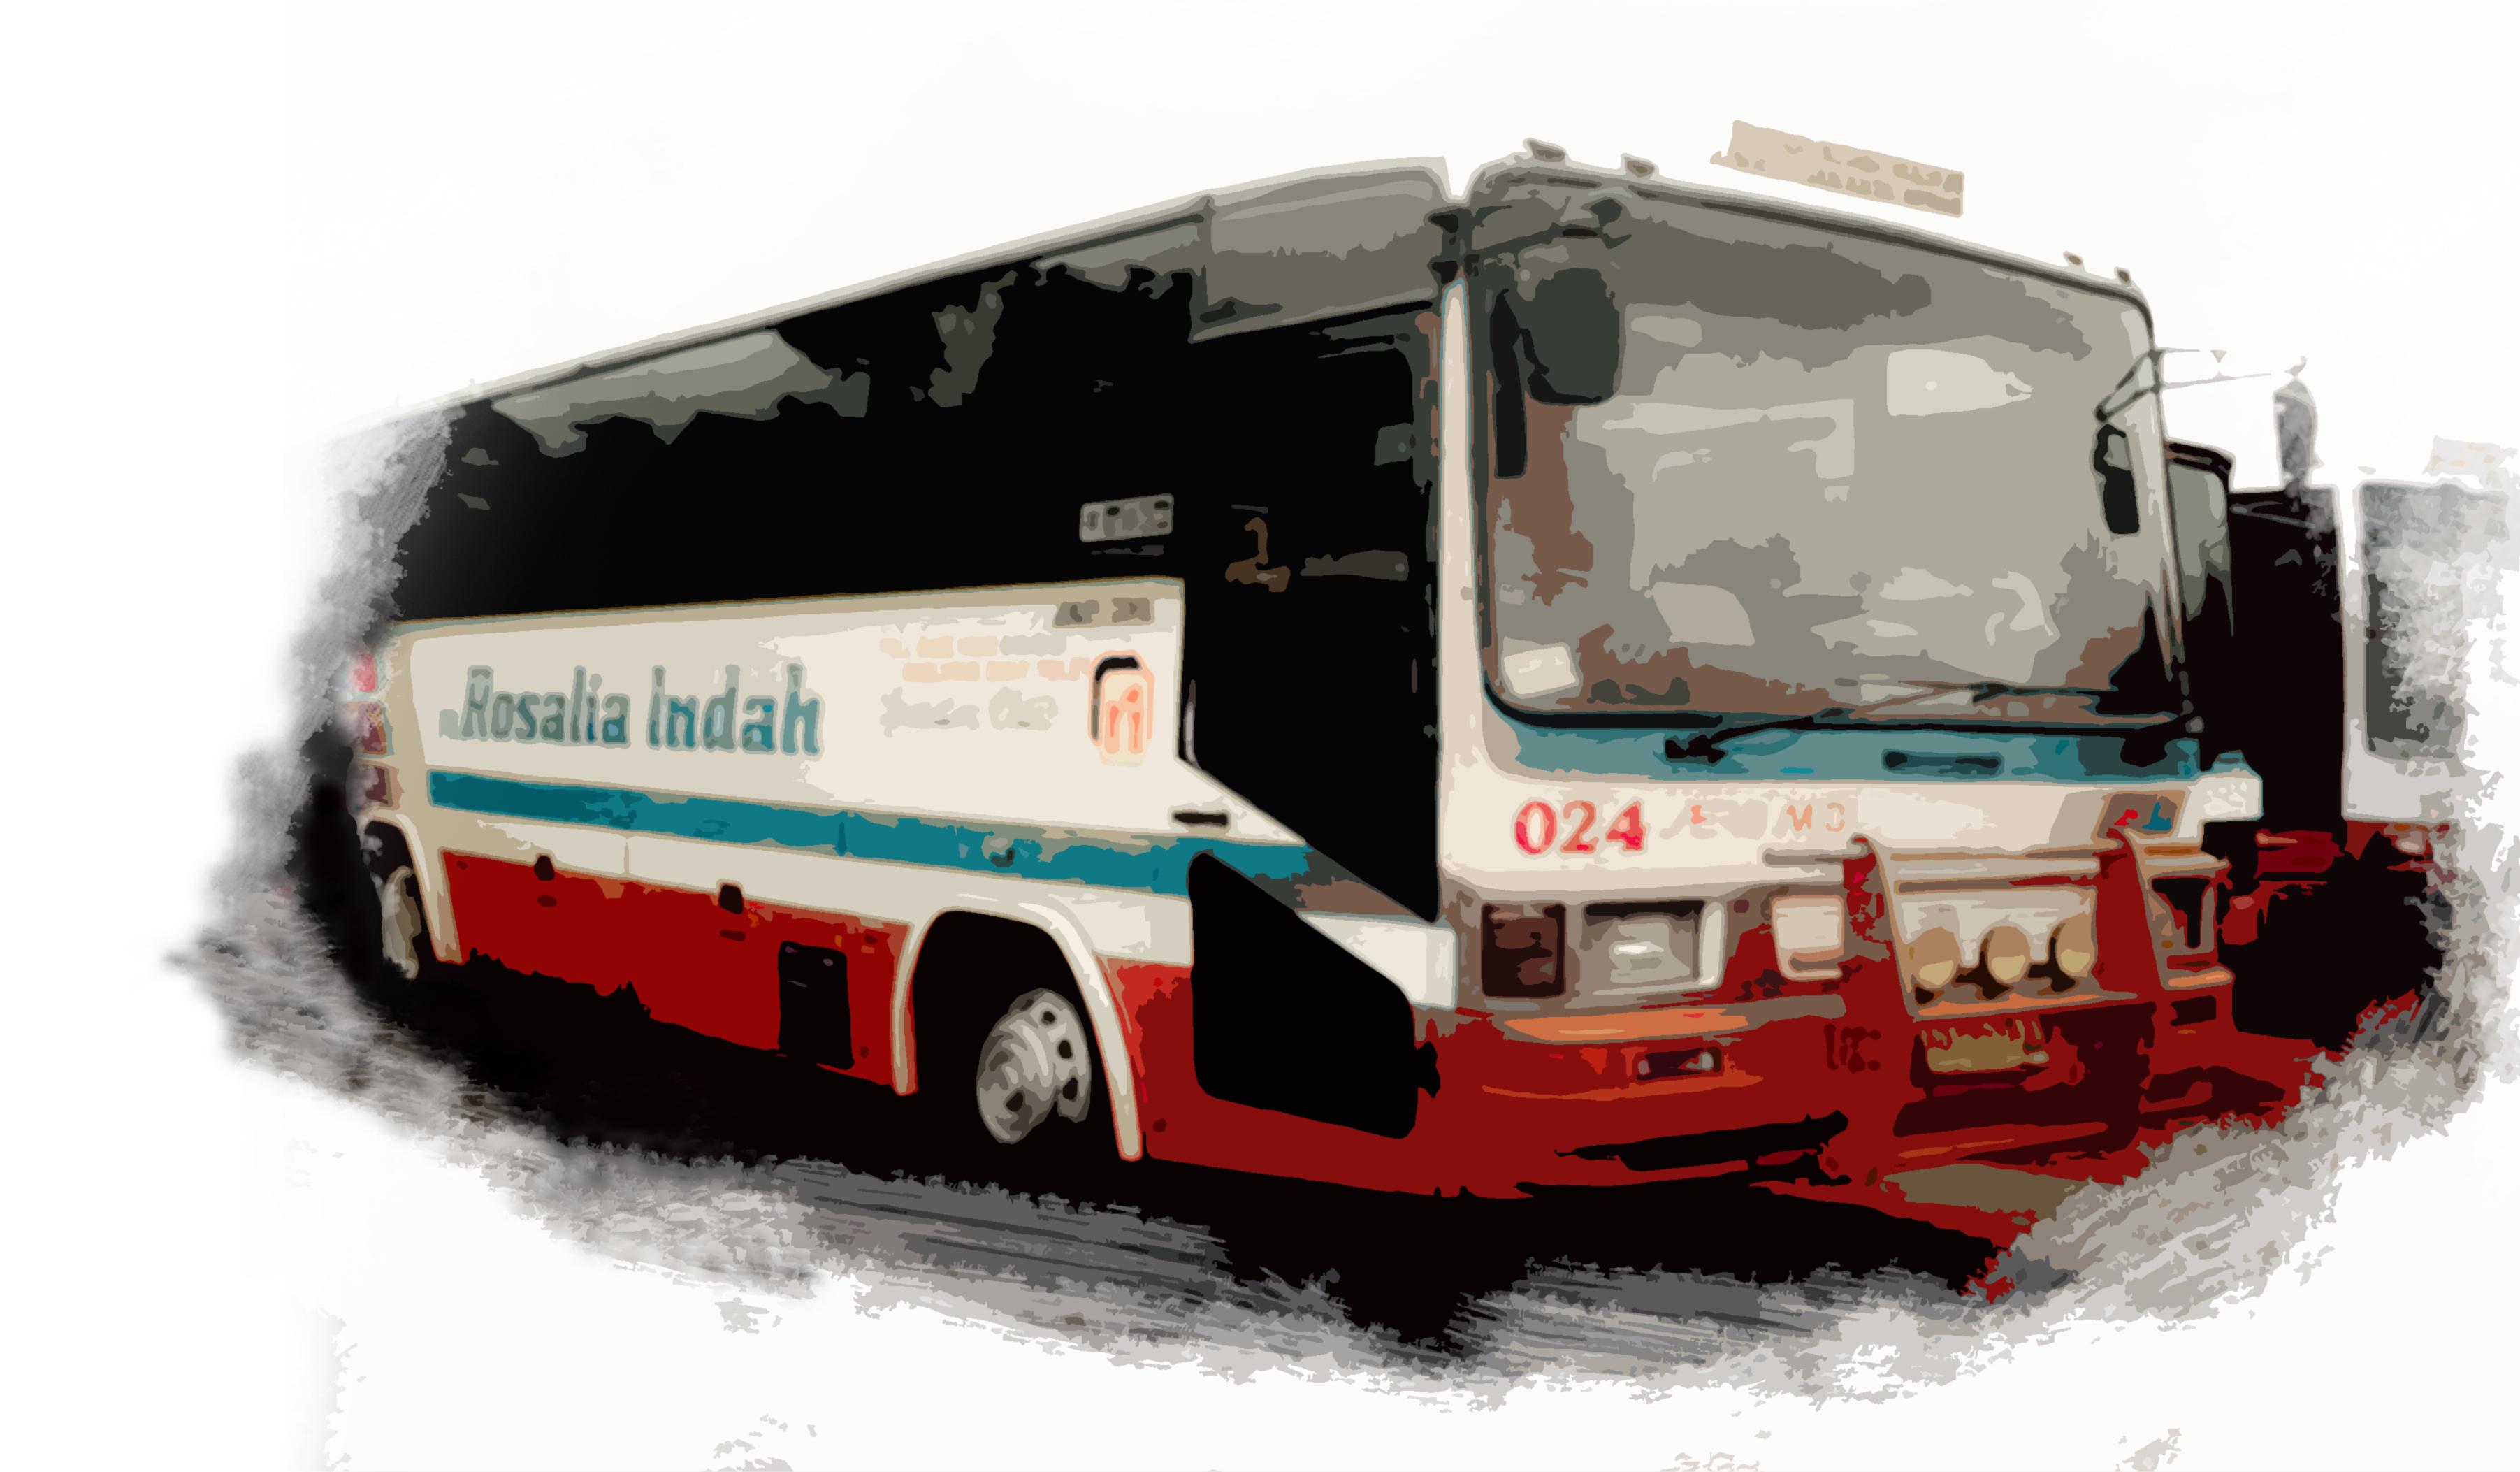 Pt Rosalia Indah Transport